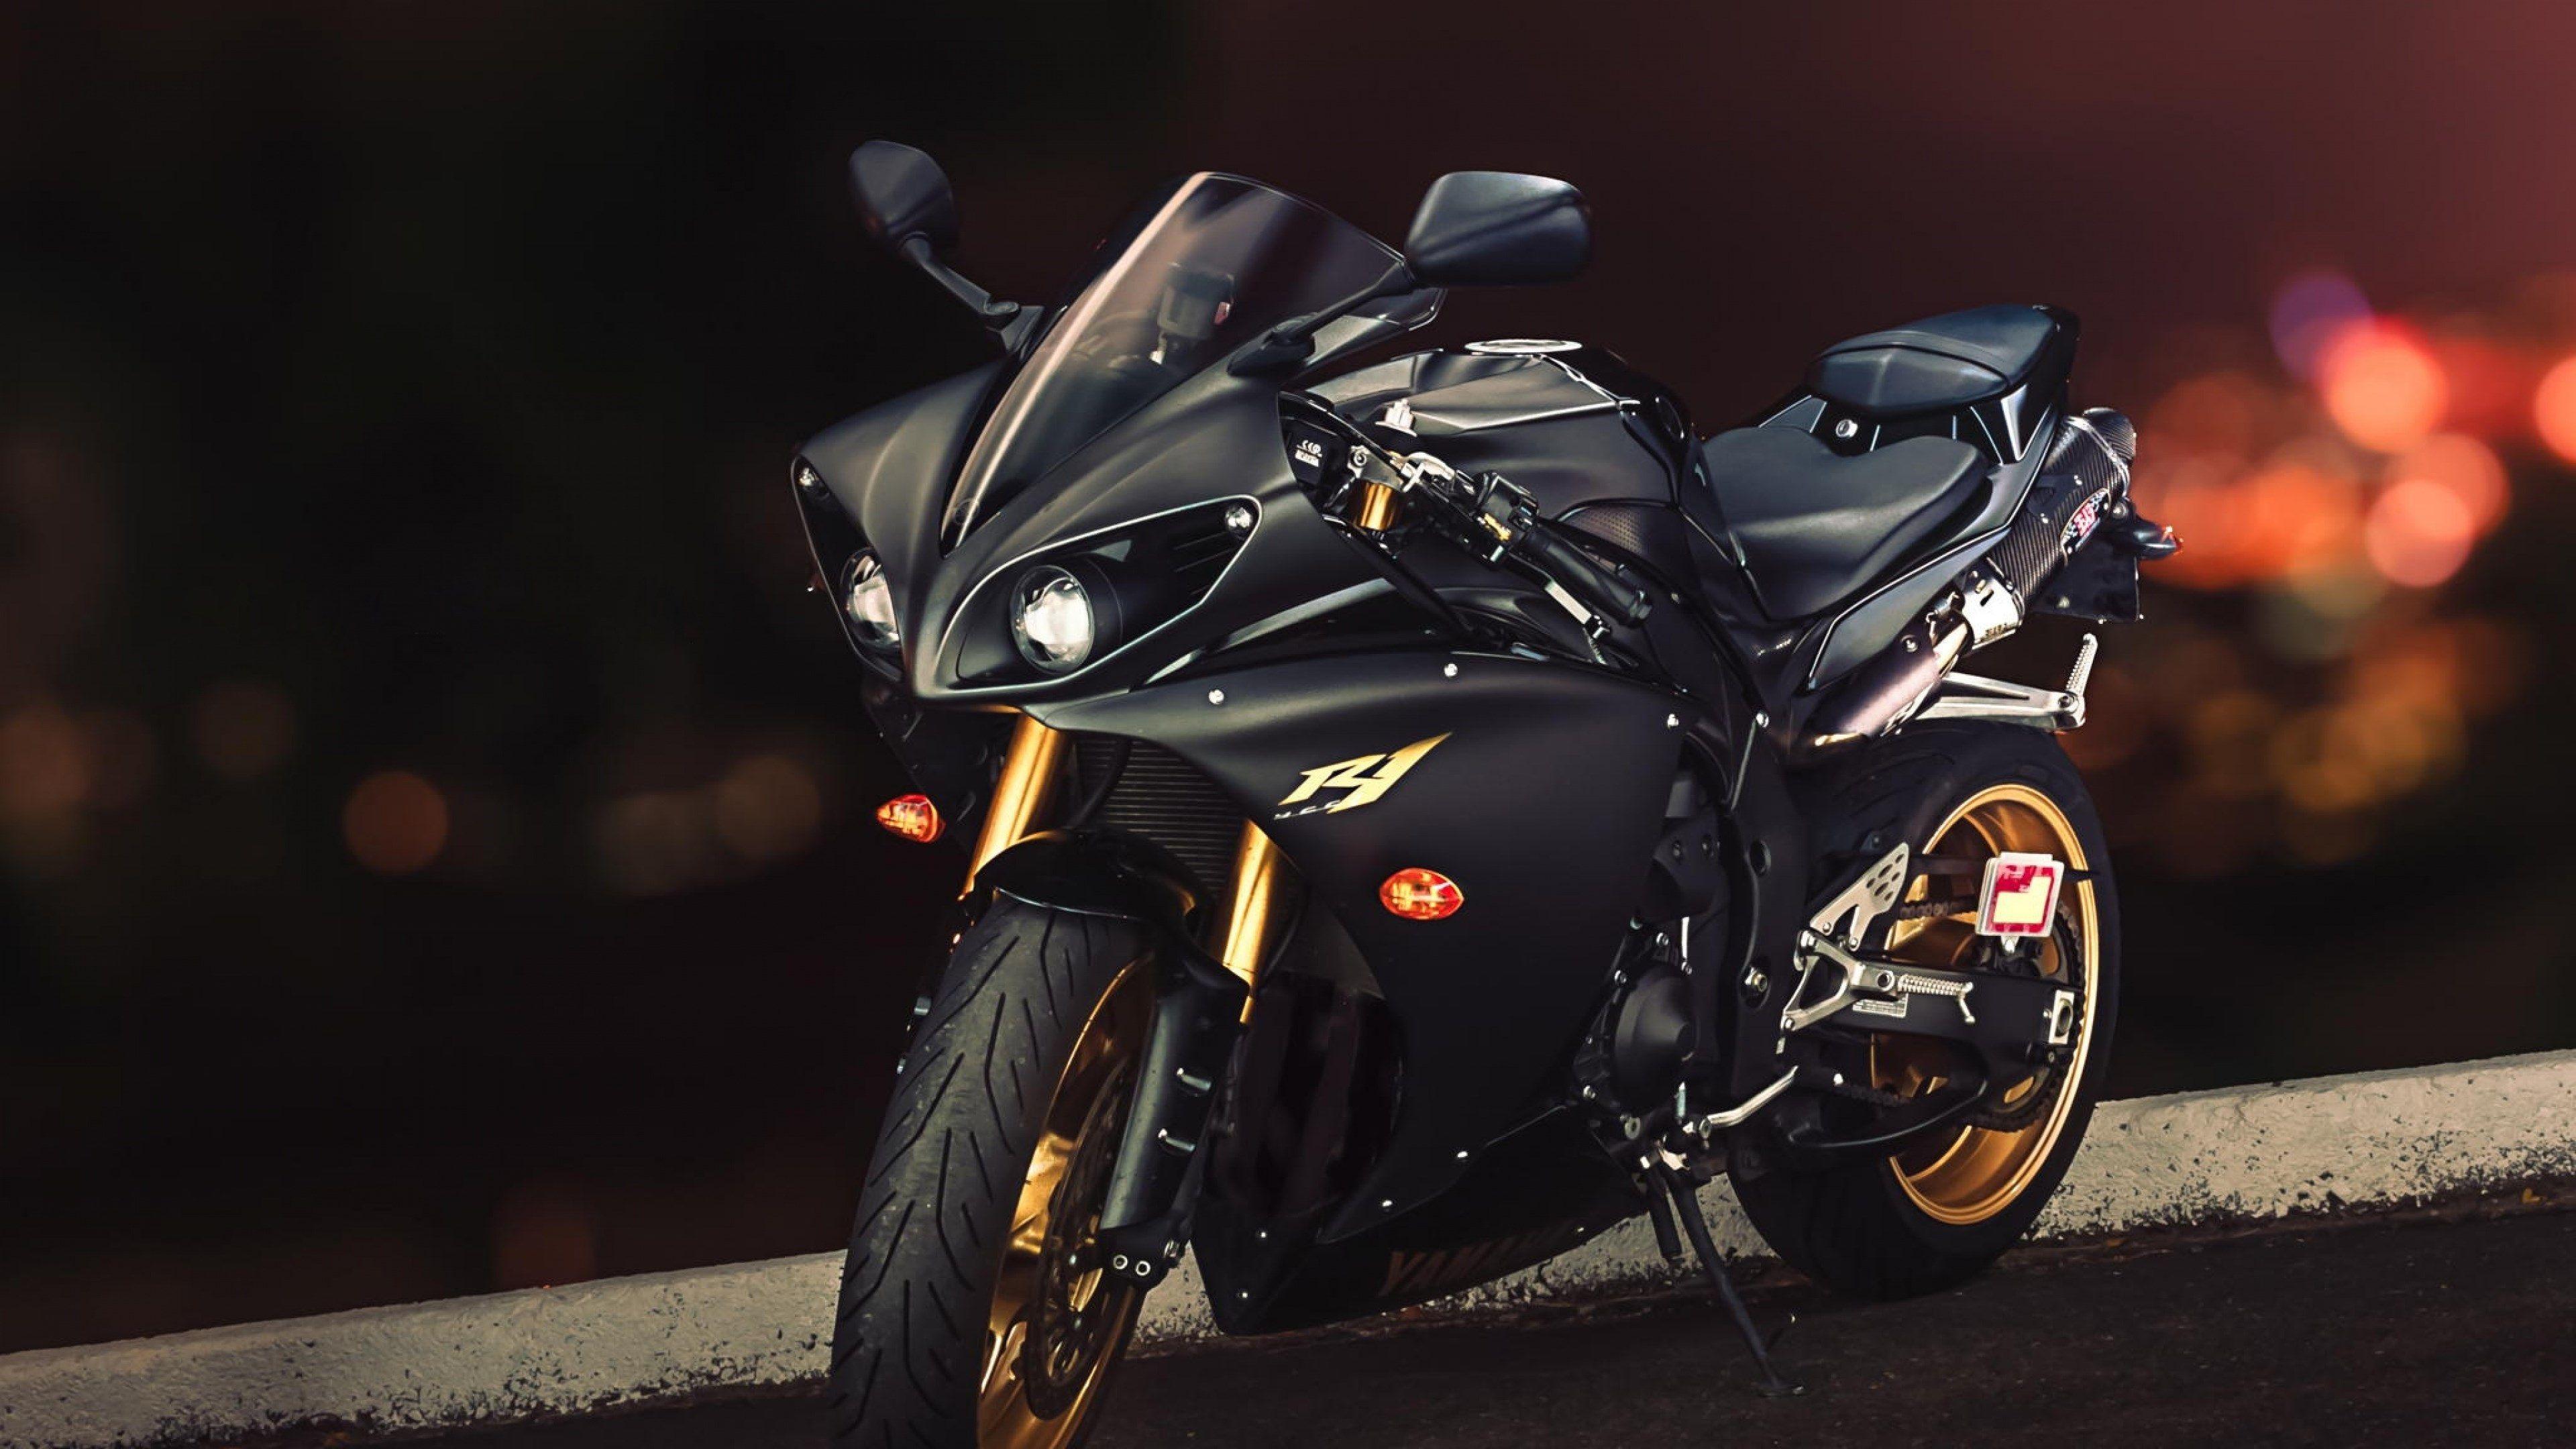 3840x2160 Yamaha 4k Windows Hd Wallpaper Free Download Yamaha R1 Motorrad Fahren Yamaha Motorrad